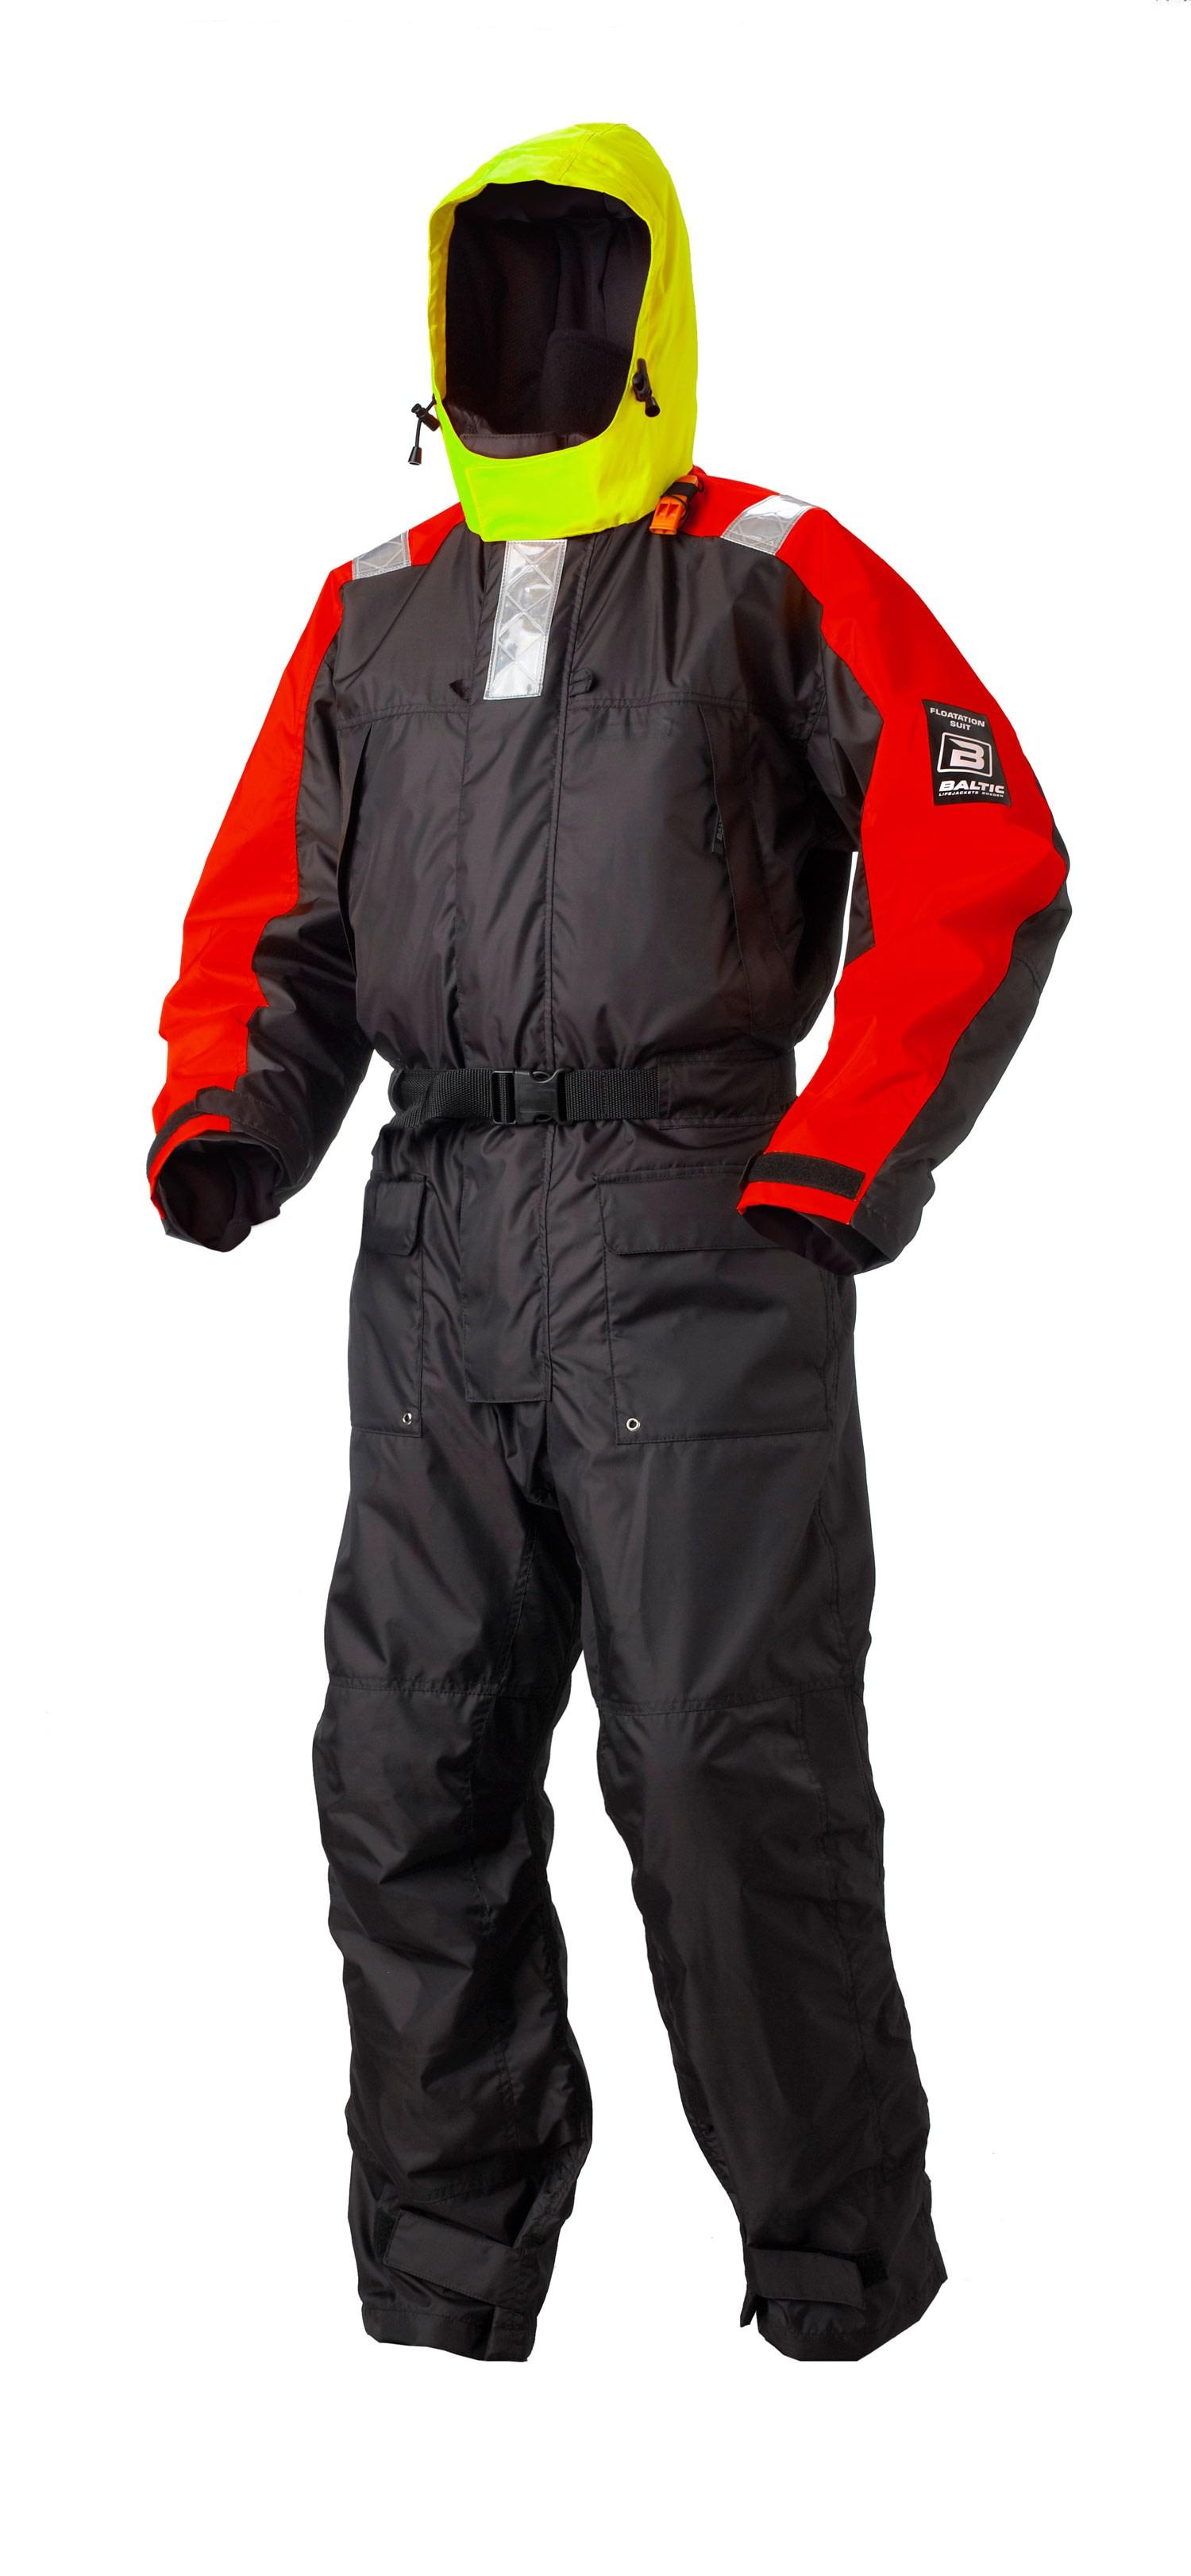 Baltic Flytoverall Amarok svart/röd Barn, 40-50kg